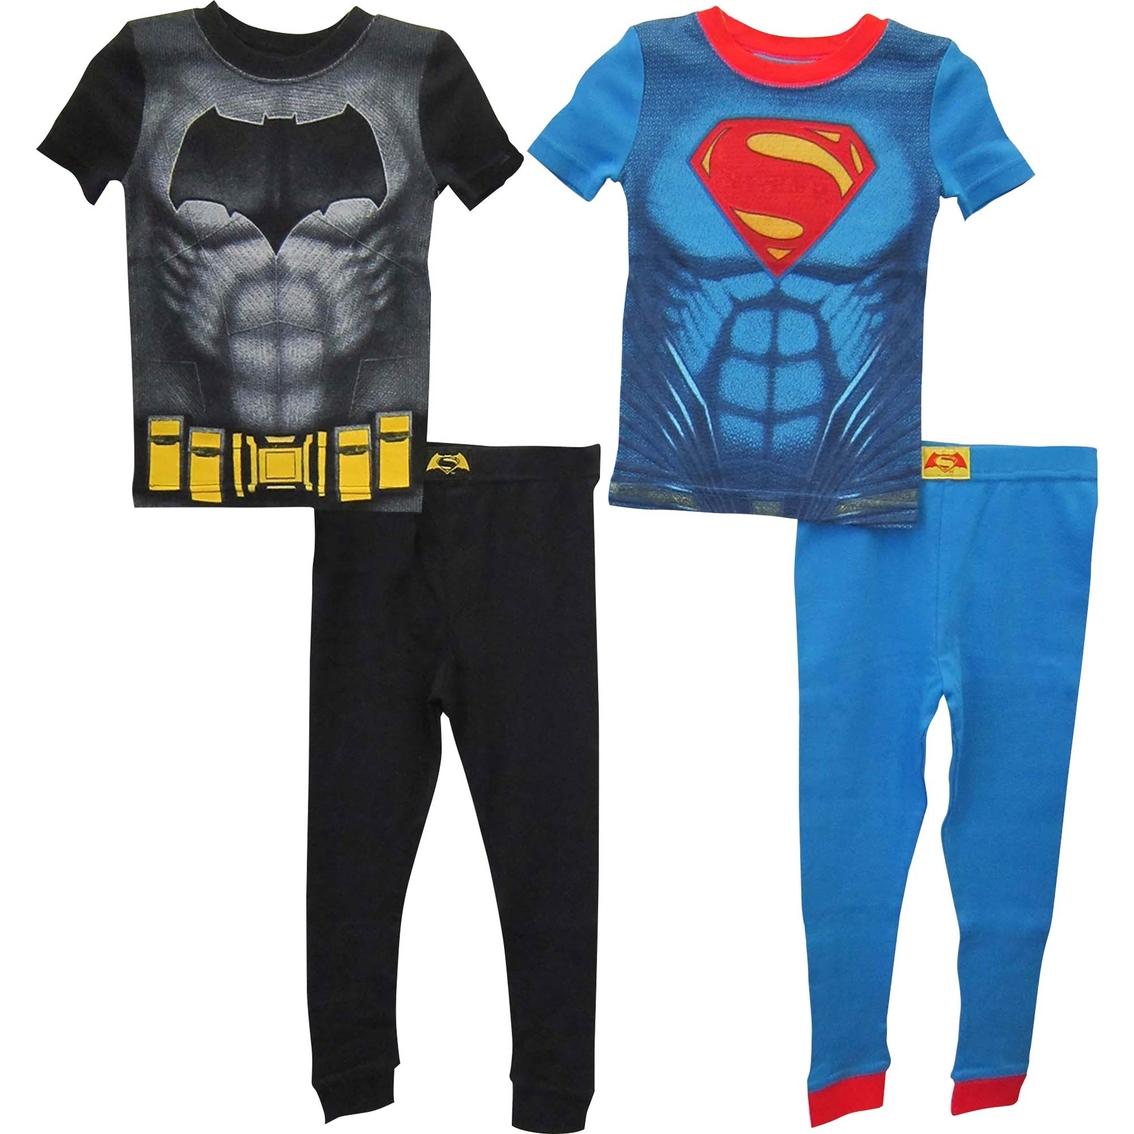 Dc Comics Toddler Boys Batman Vs. Superman 4 Pc. Pajama Set ... fa8fcc451